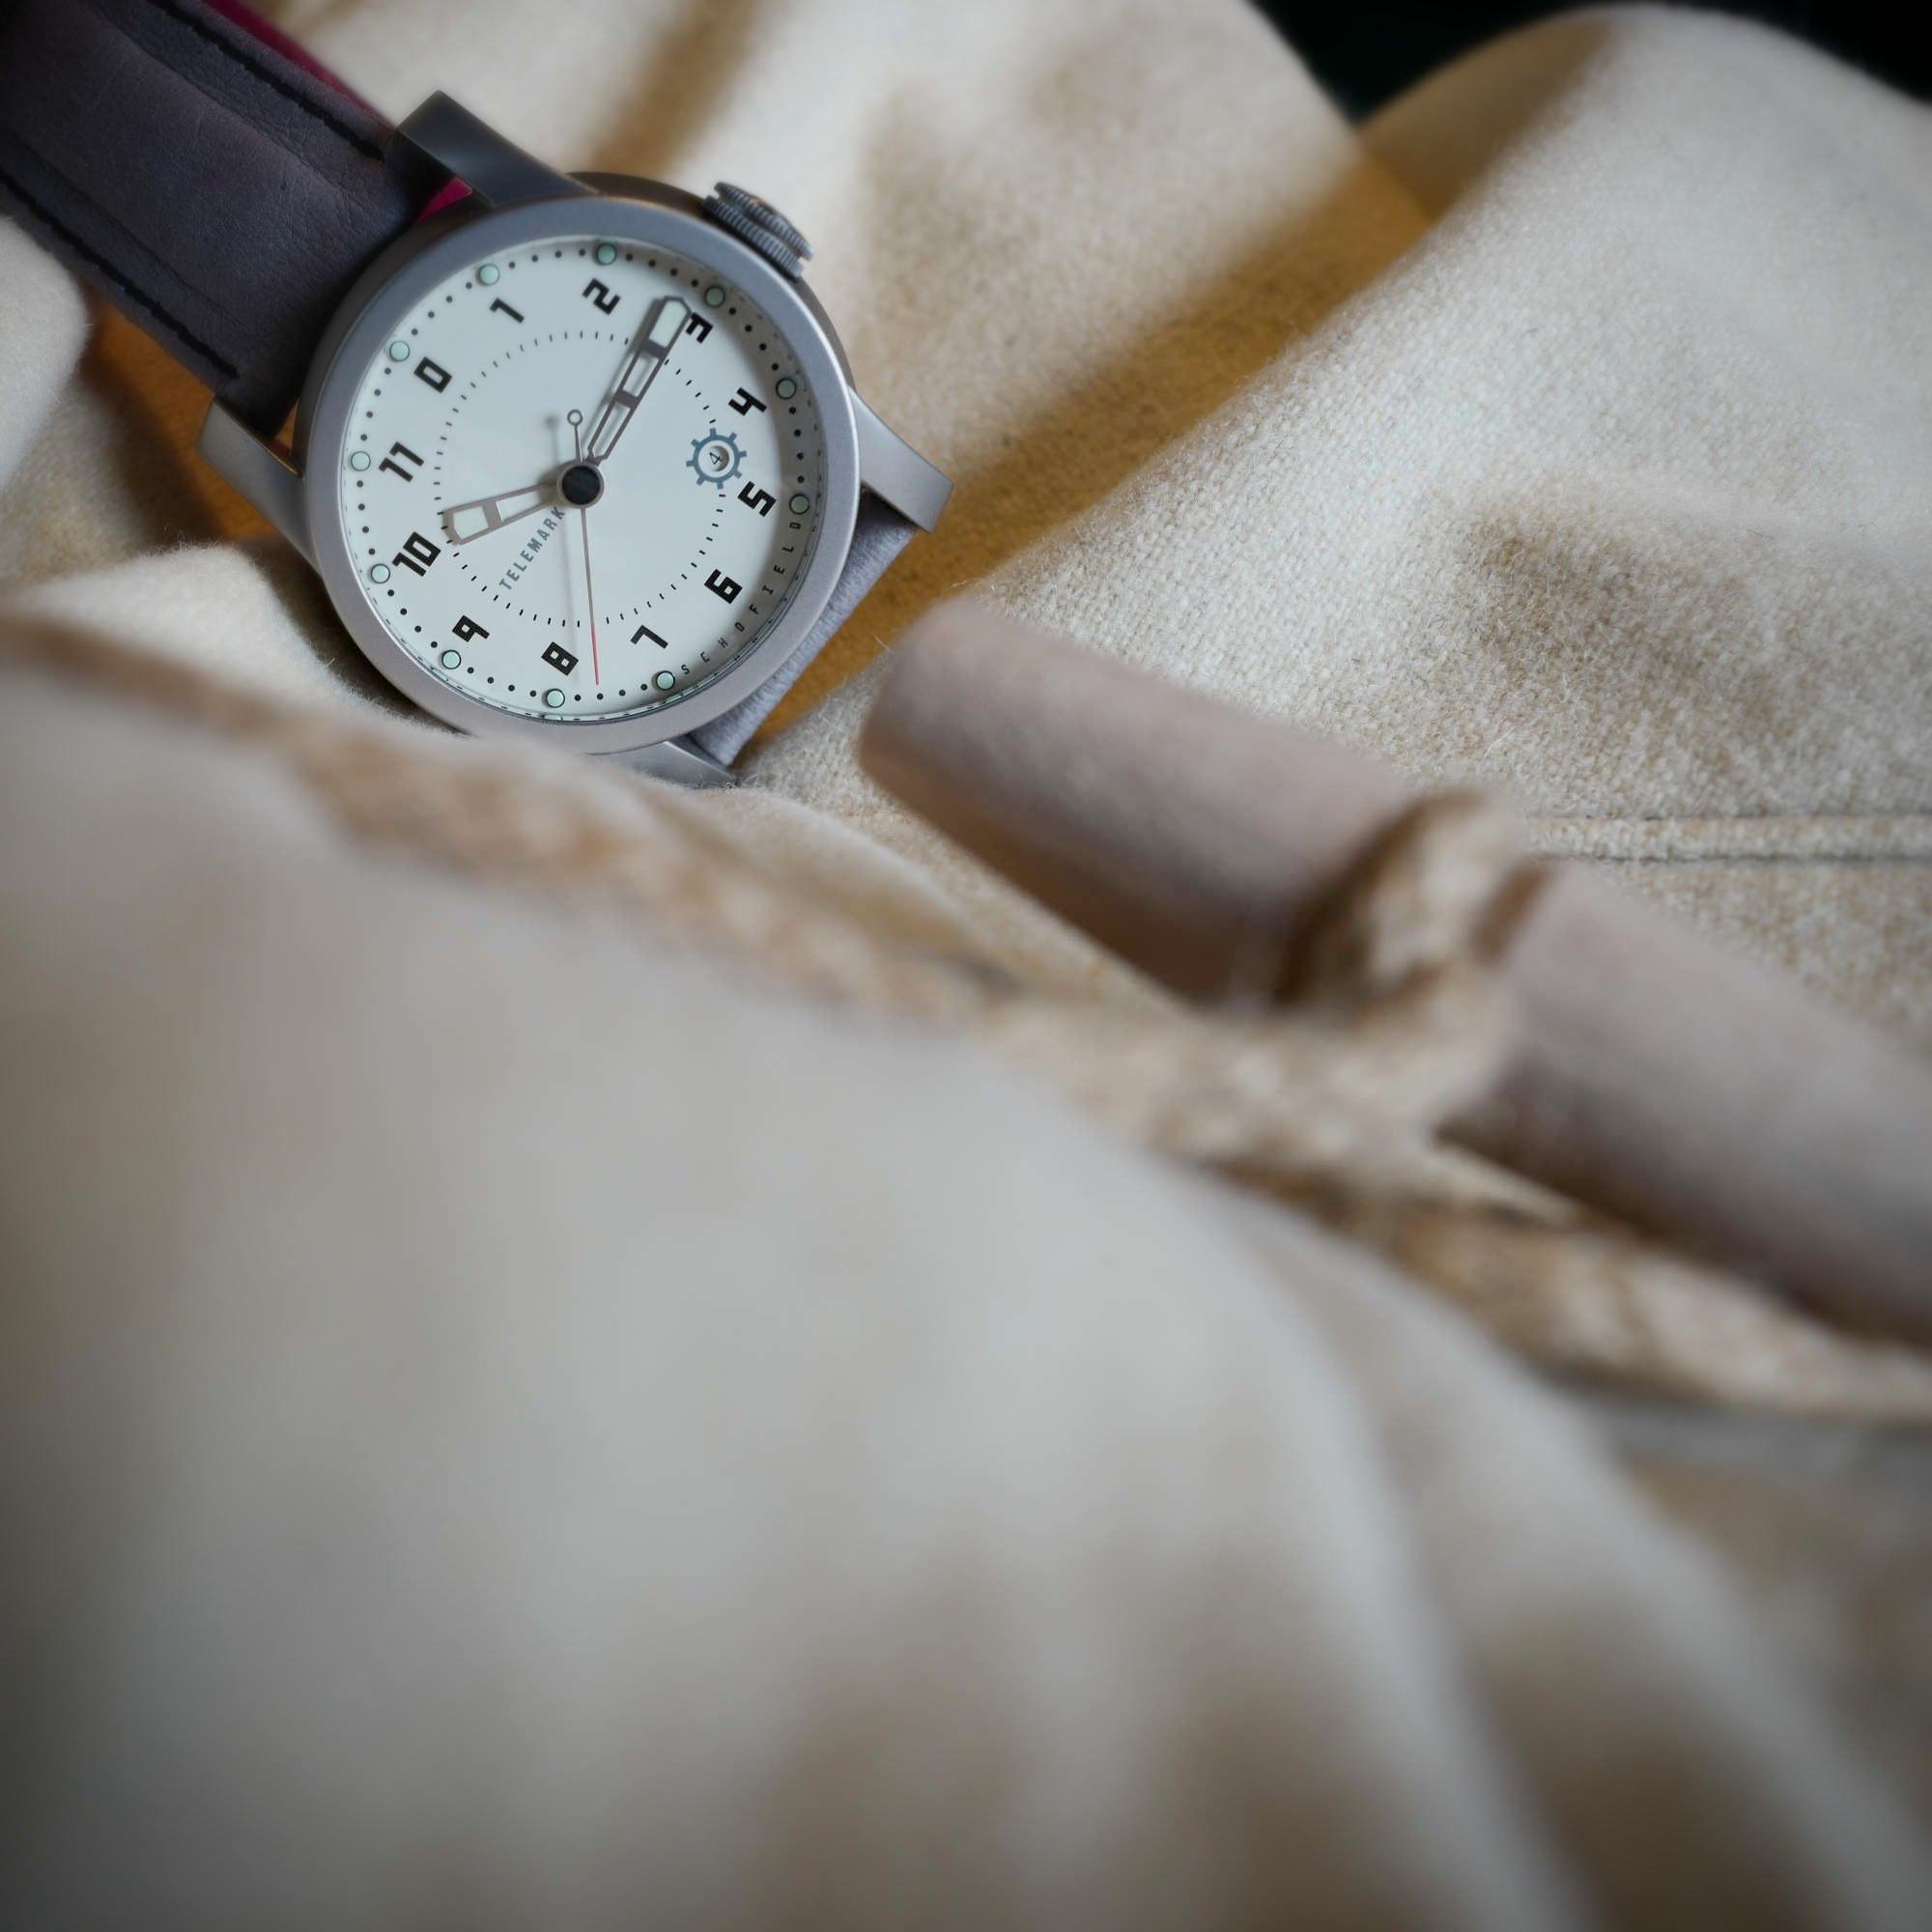 British watches